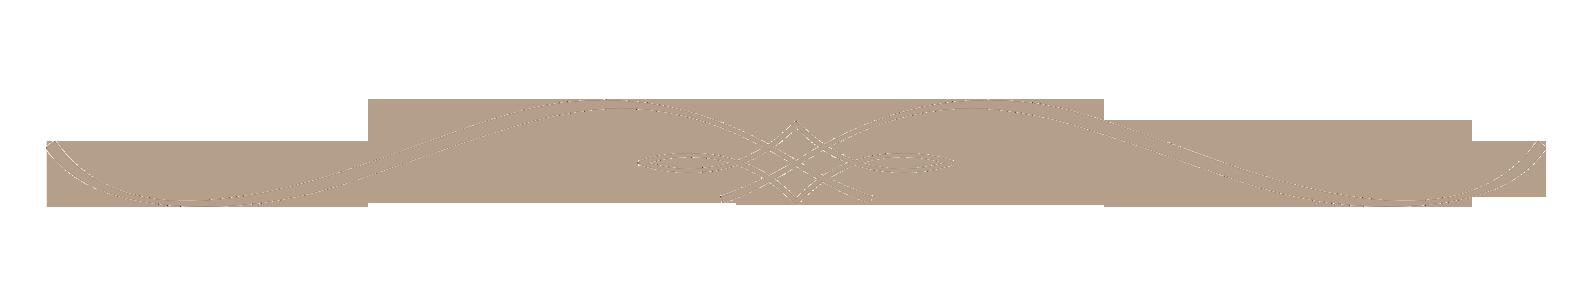 Cross divider clipart clip art transparent stock divider.png (1589×304) | Fancy dividers | Pinterest clip art transparent stock